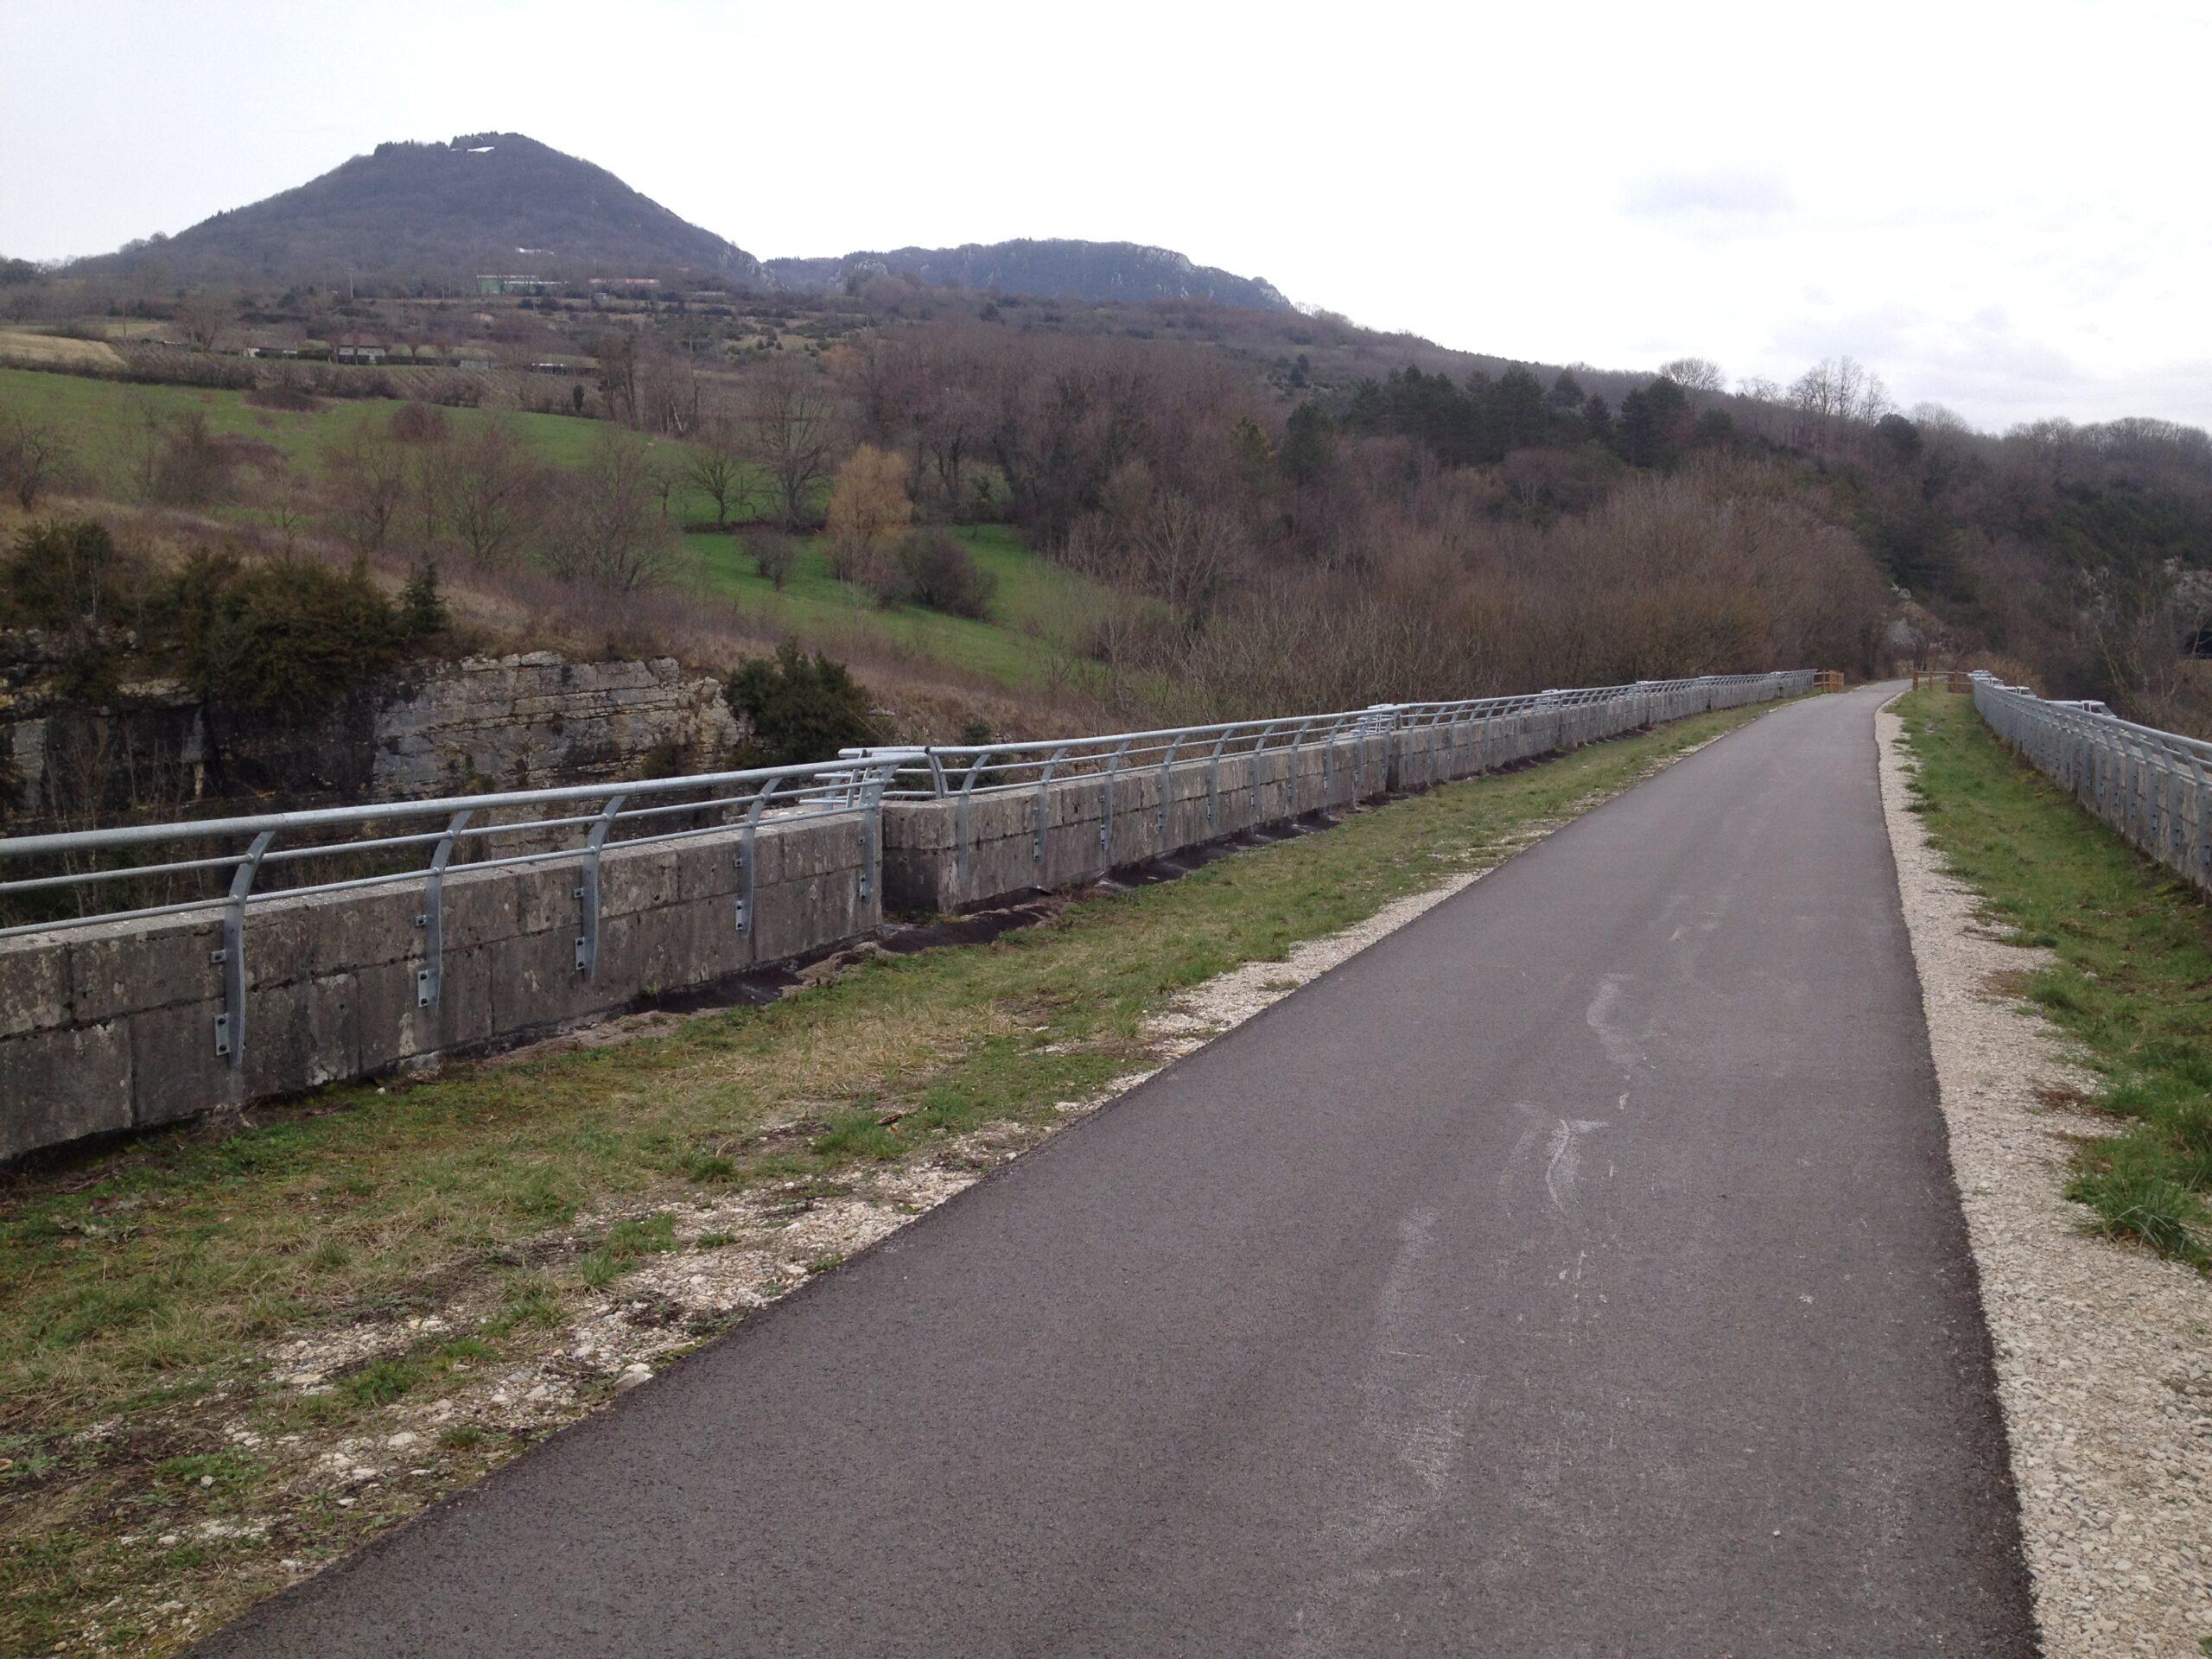 Viaduc des Salines